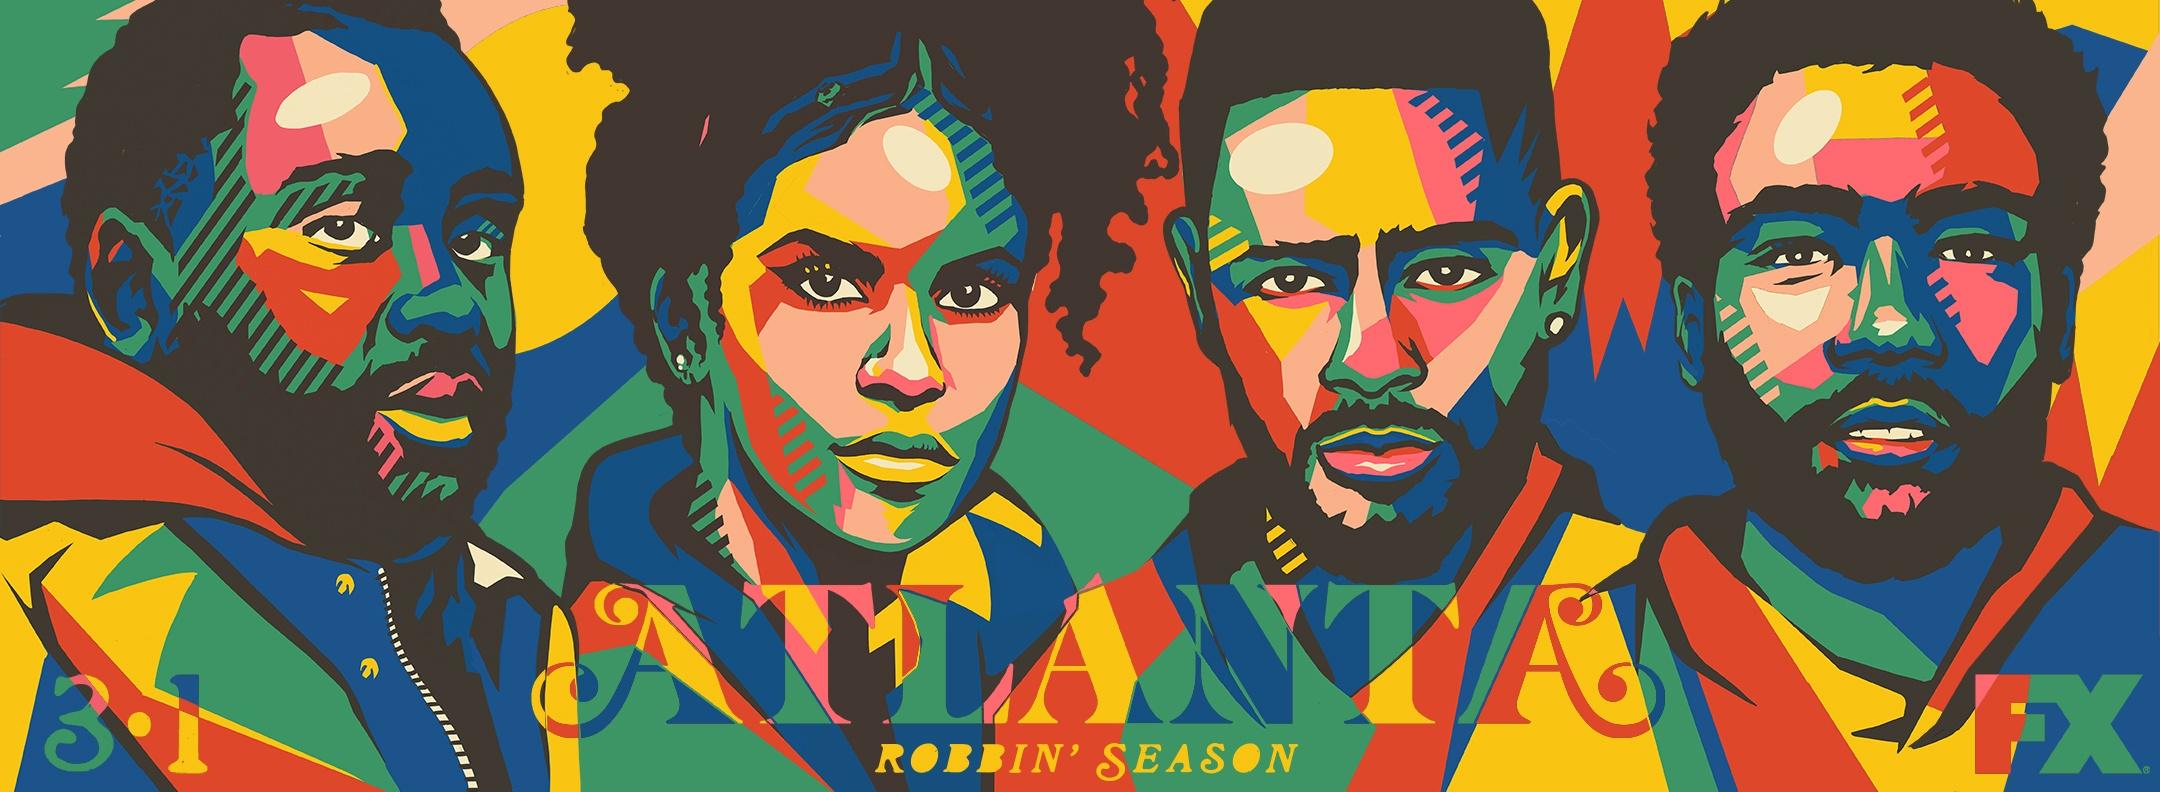 Thumbnail for Atlanta Robbin' Season Mural